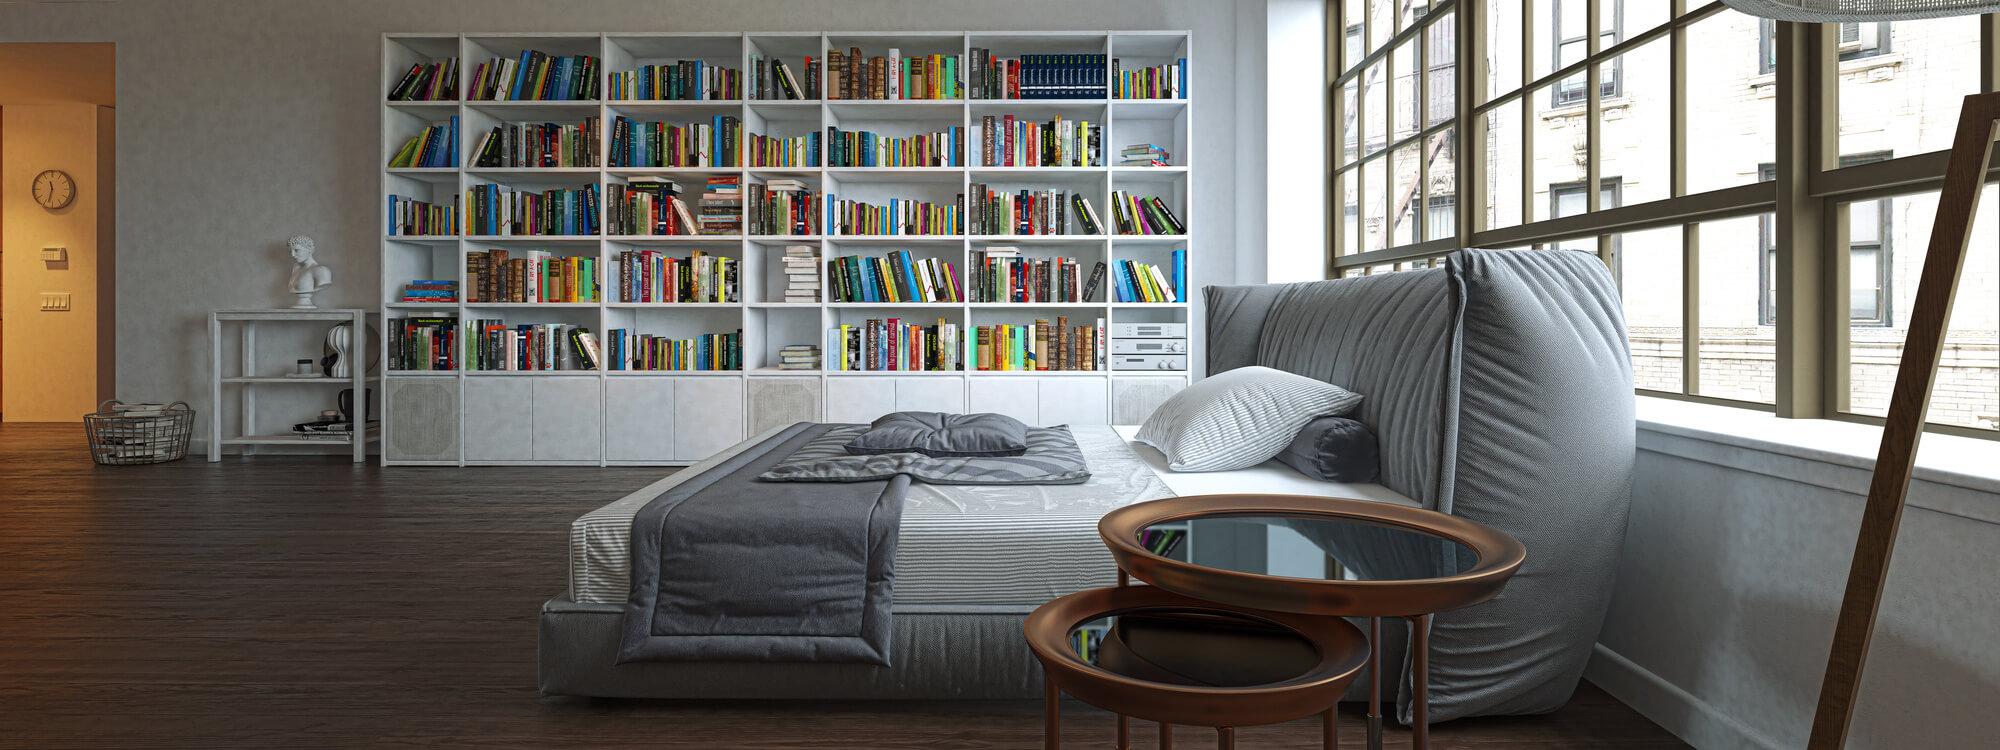 bedroom makeover, interior design